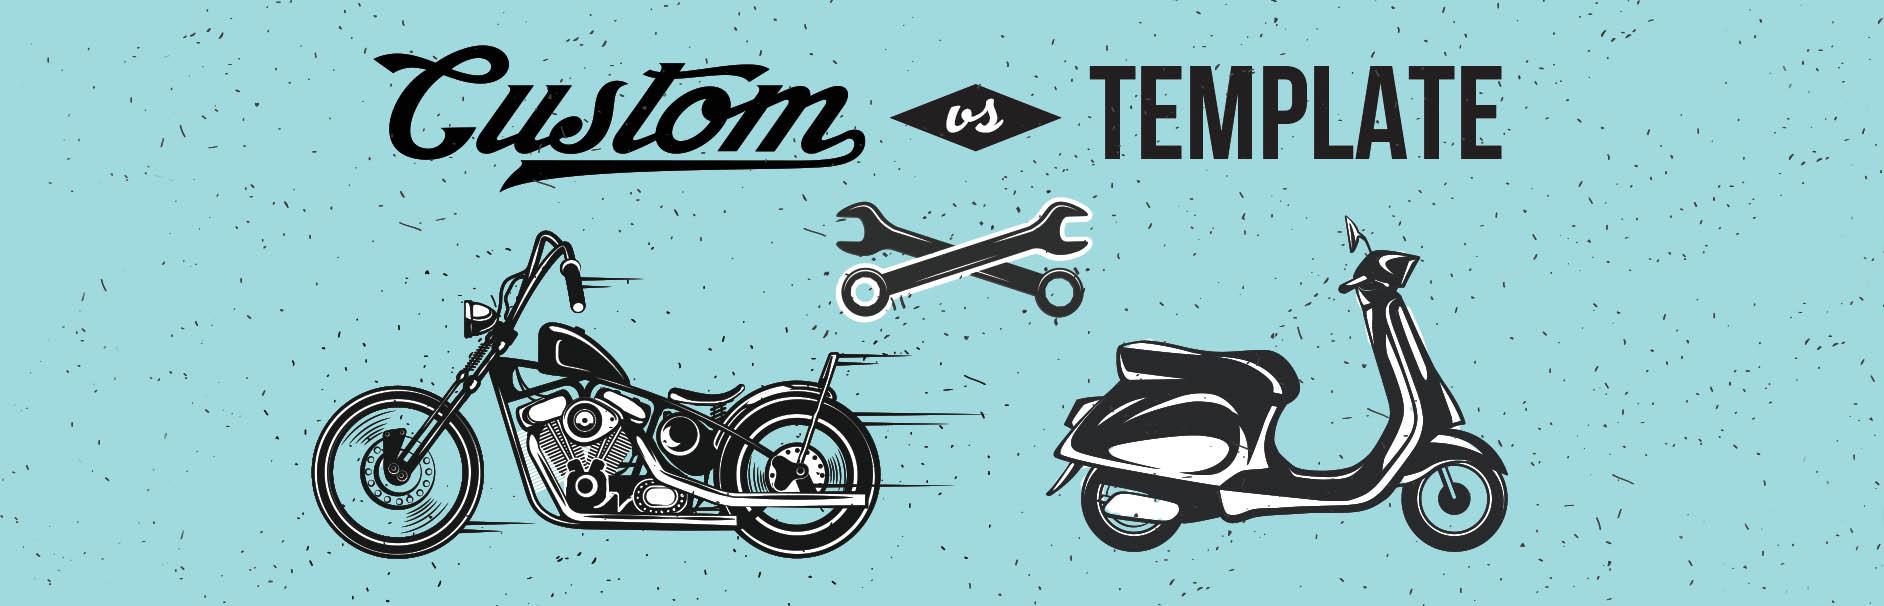 custom vs template